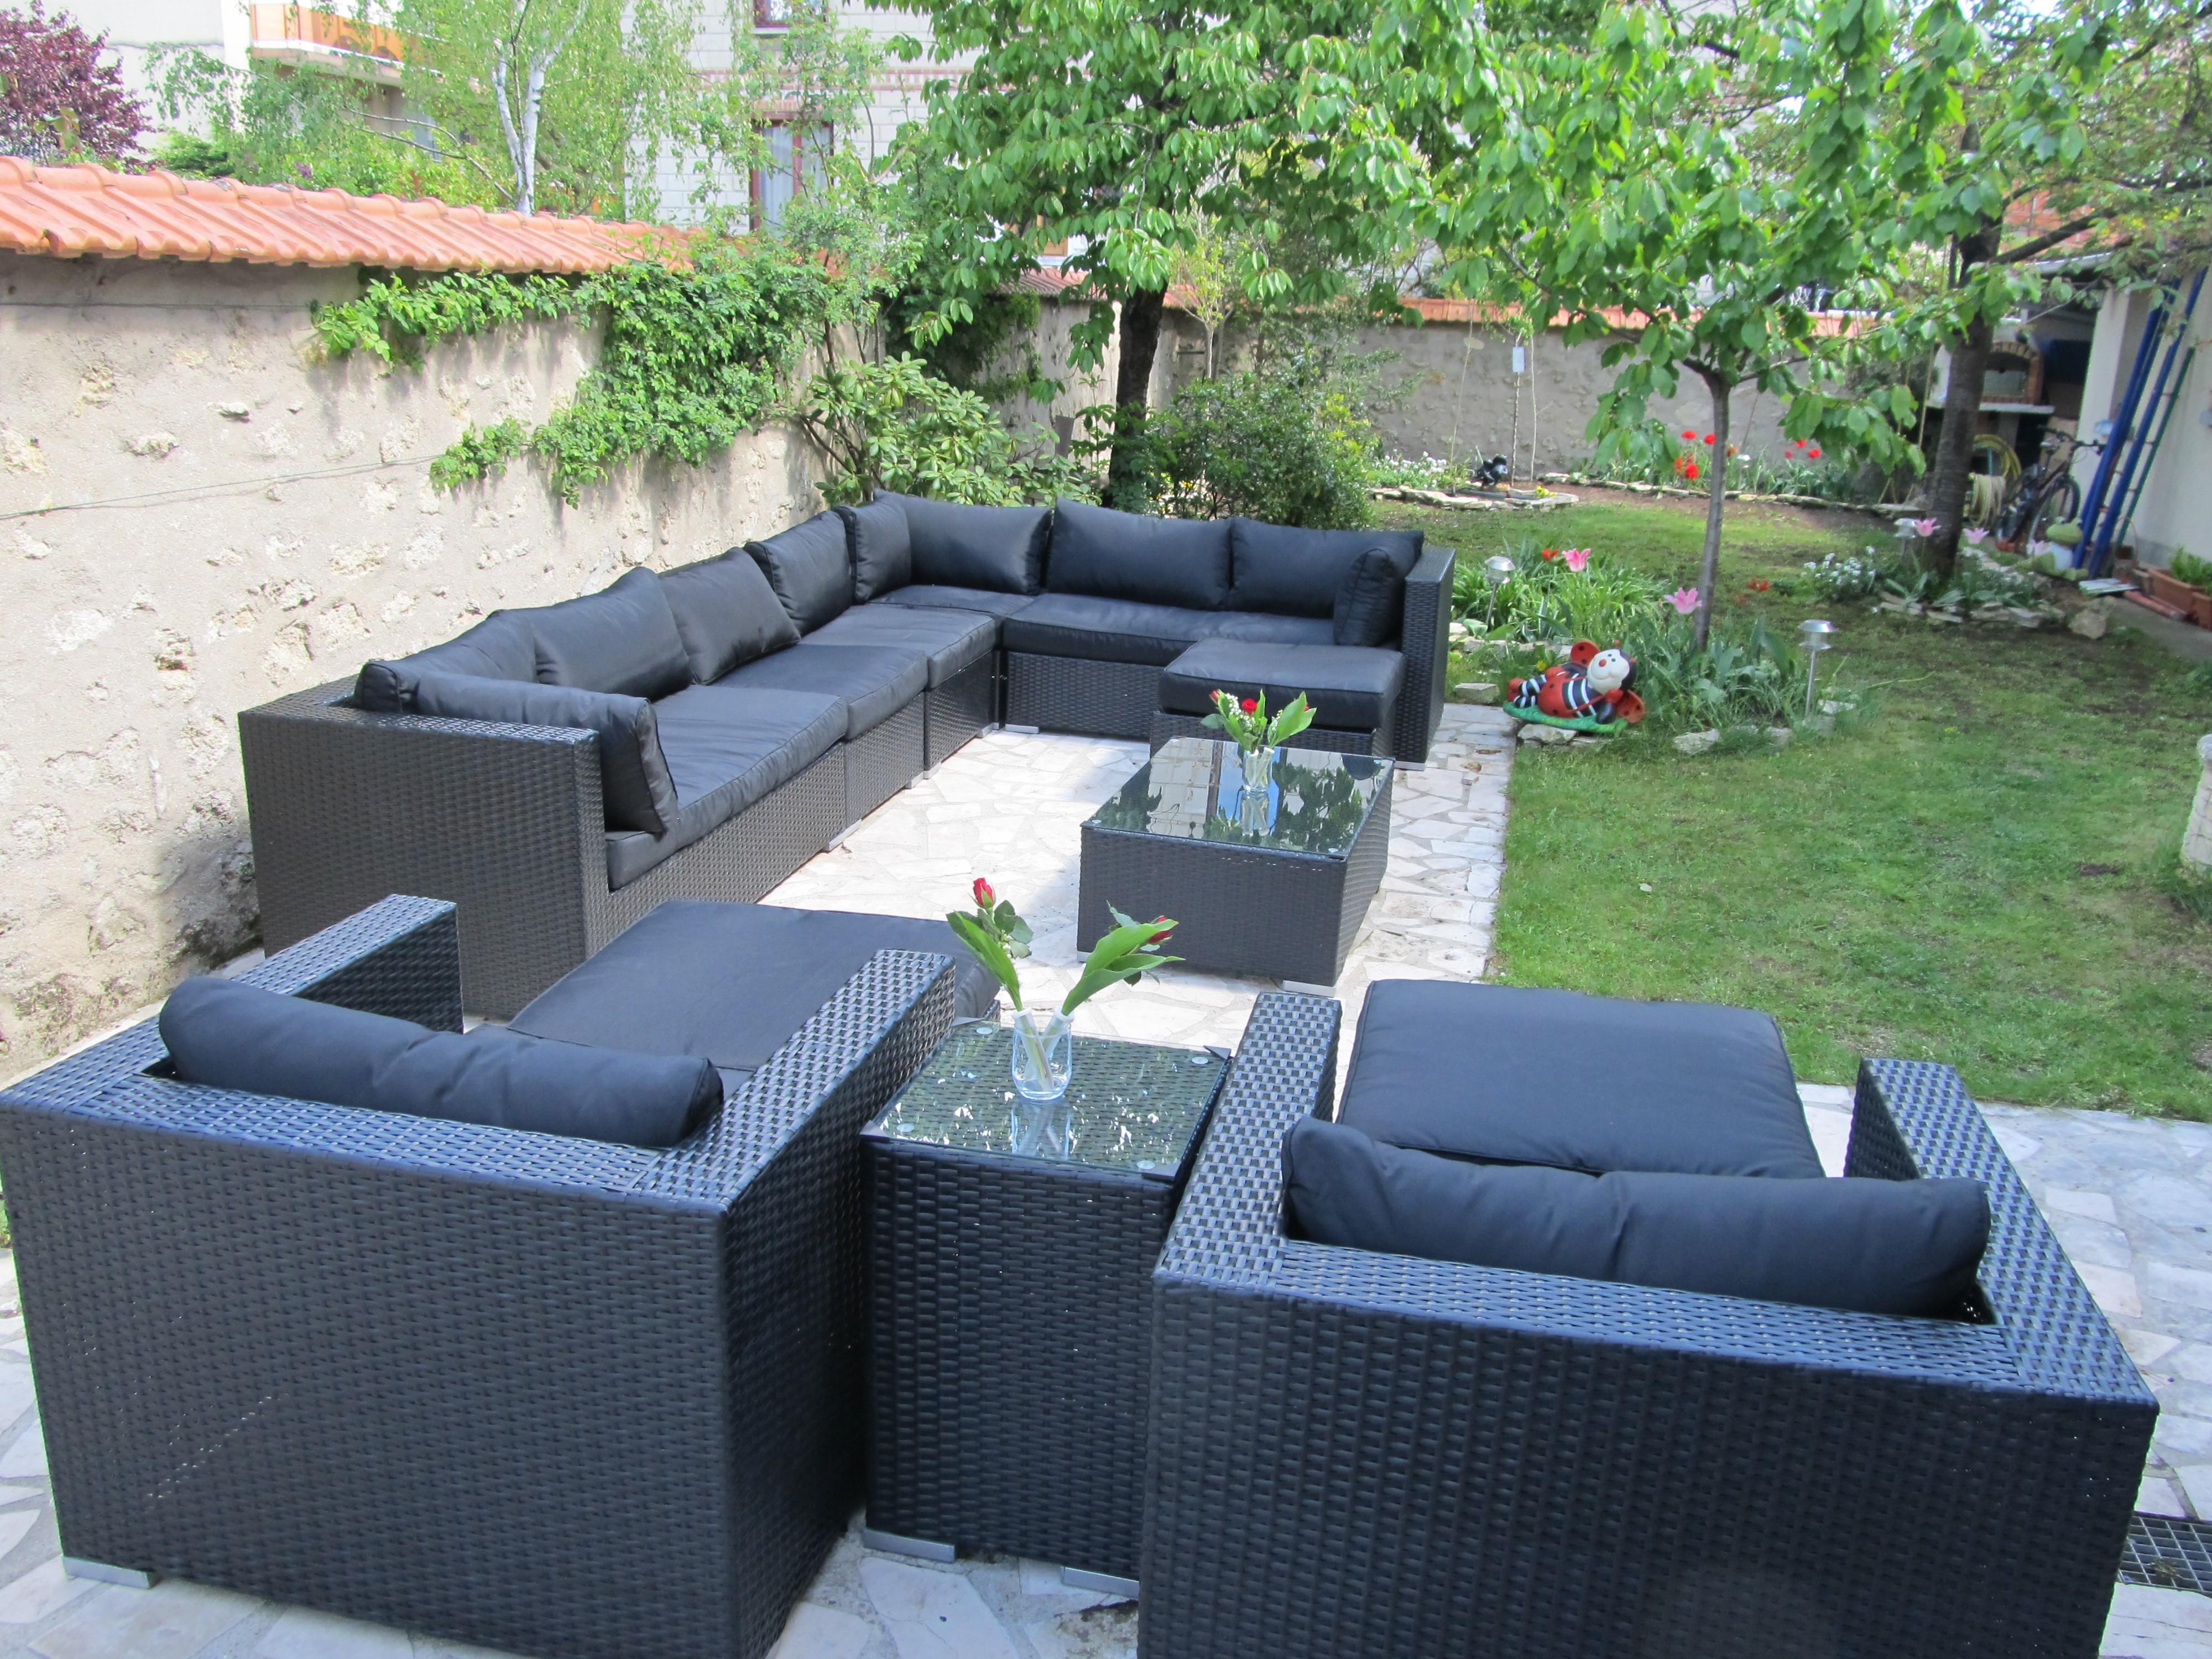 Salon de jardin collection havana - Jardin piscine et Cabane